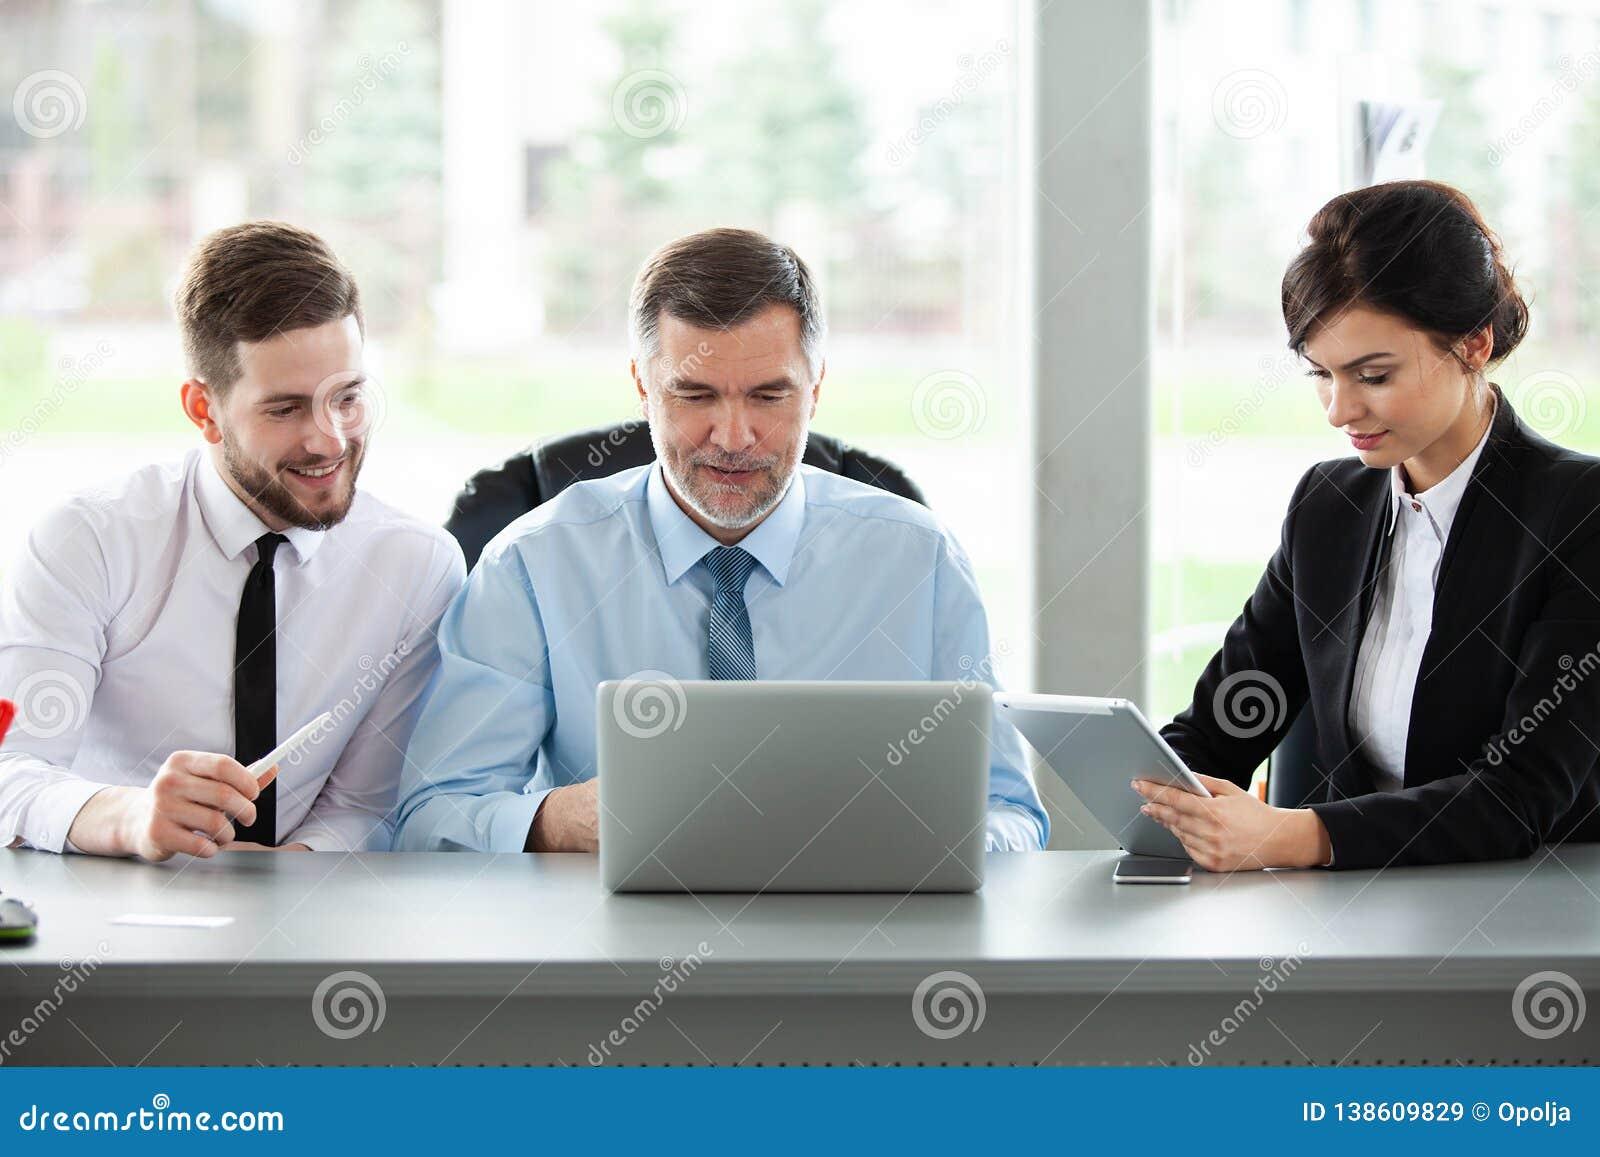 Trabajo junto Negocio Team Discussion Meeting Corporate Concept